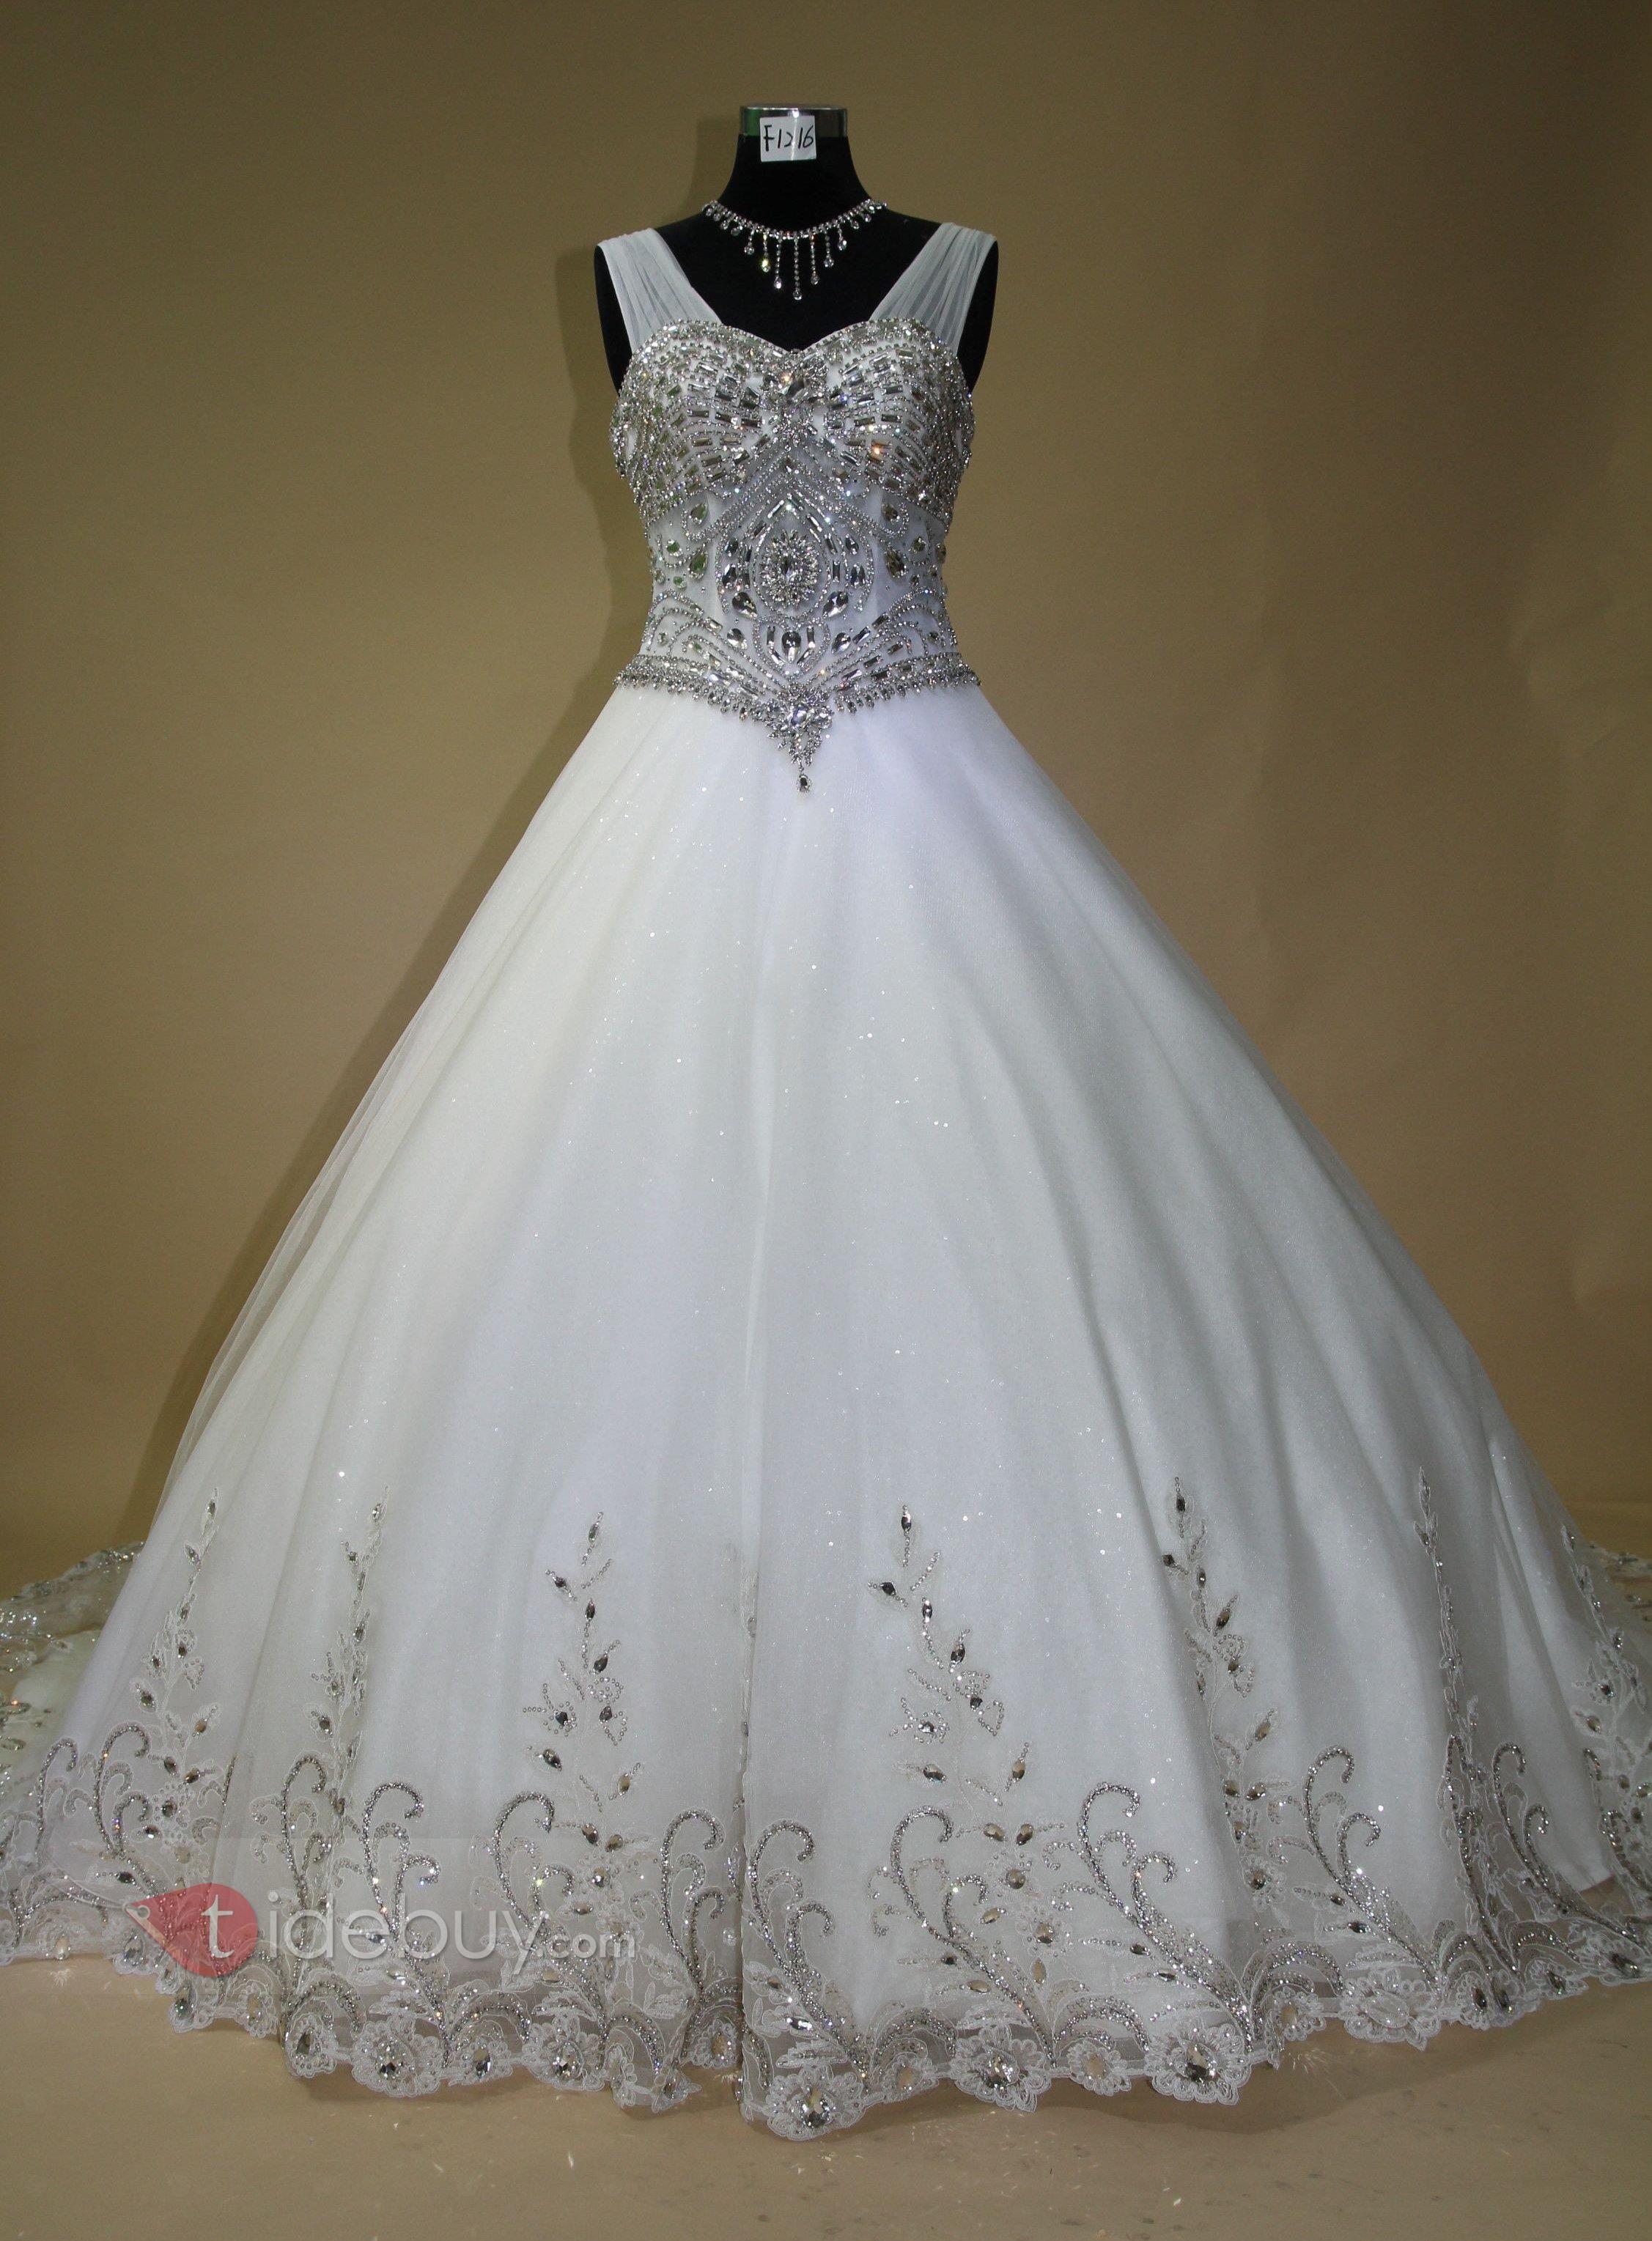 South asian wedding dresses  ストラップスイートハートラインストーンボールガウンウエデイングドレス